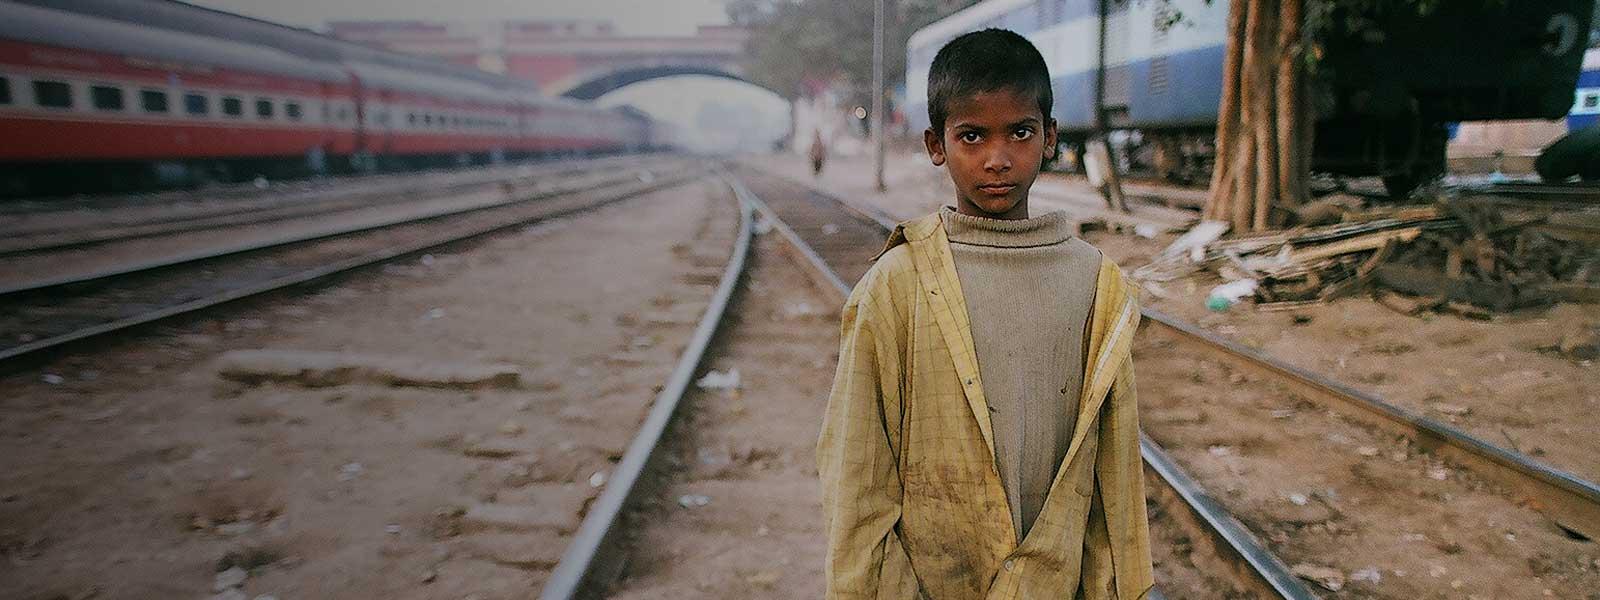 Volunteerism & Charitable Contributions Off the rails hero